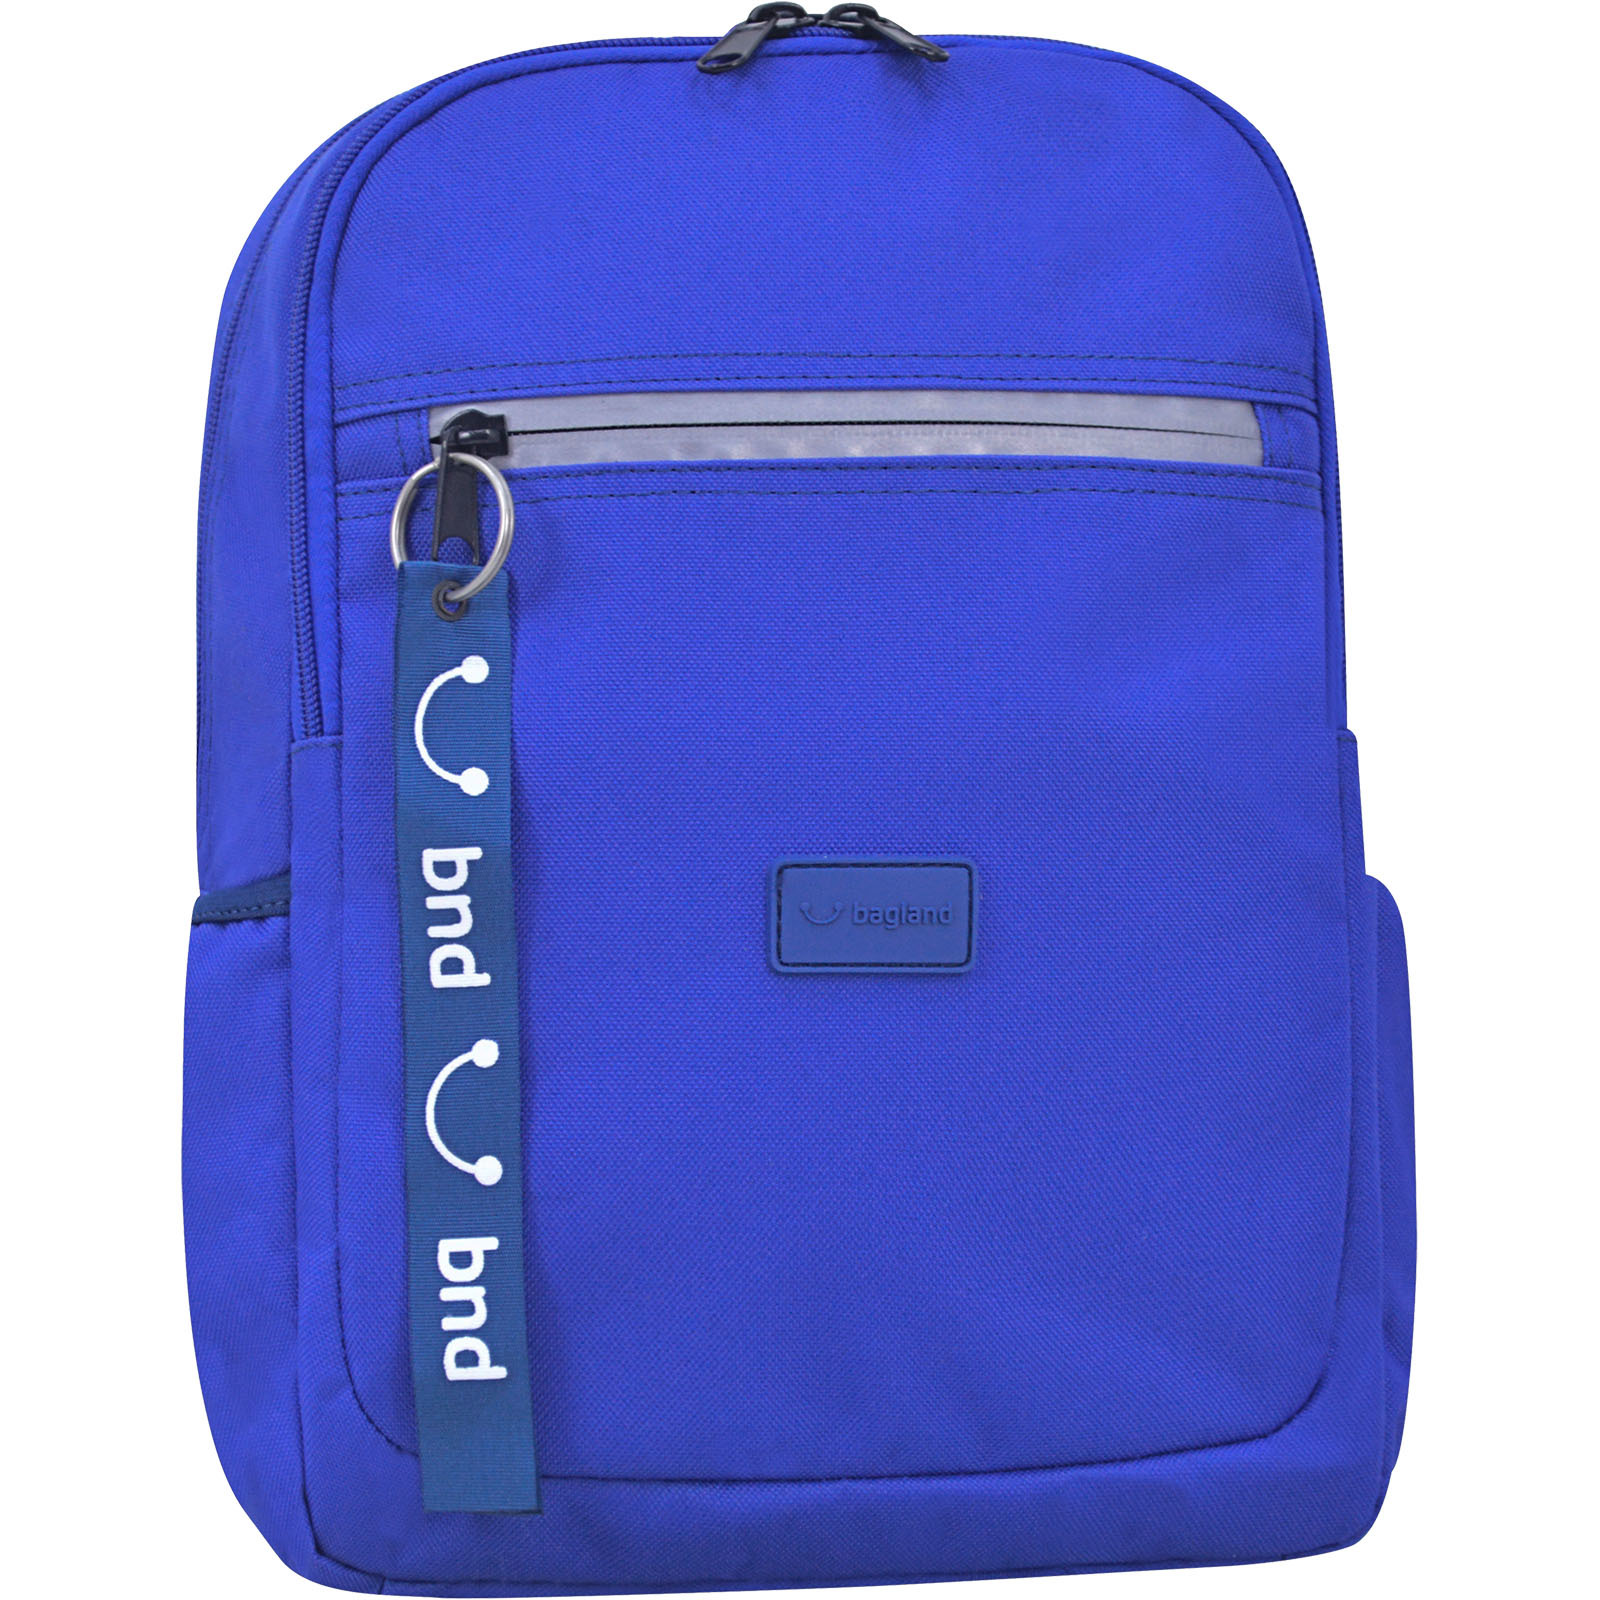 Детские рюкзаки Рюкзак Bagland Young 13 л. электрик (0051066) DSC_1071-1600.jpg